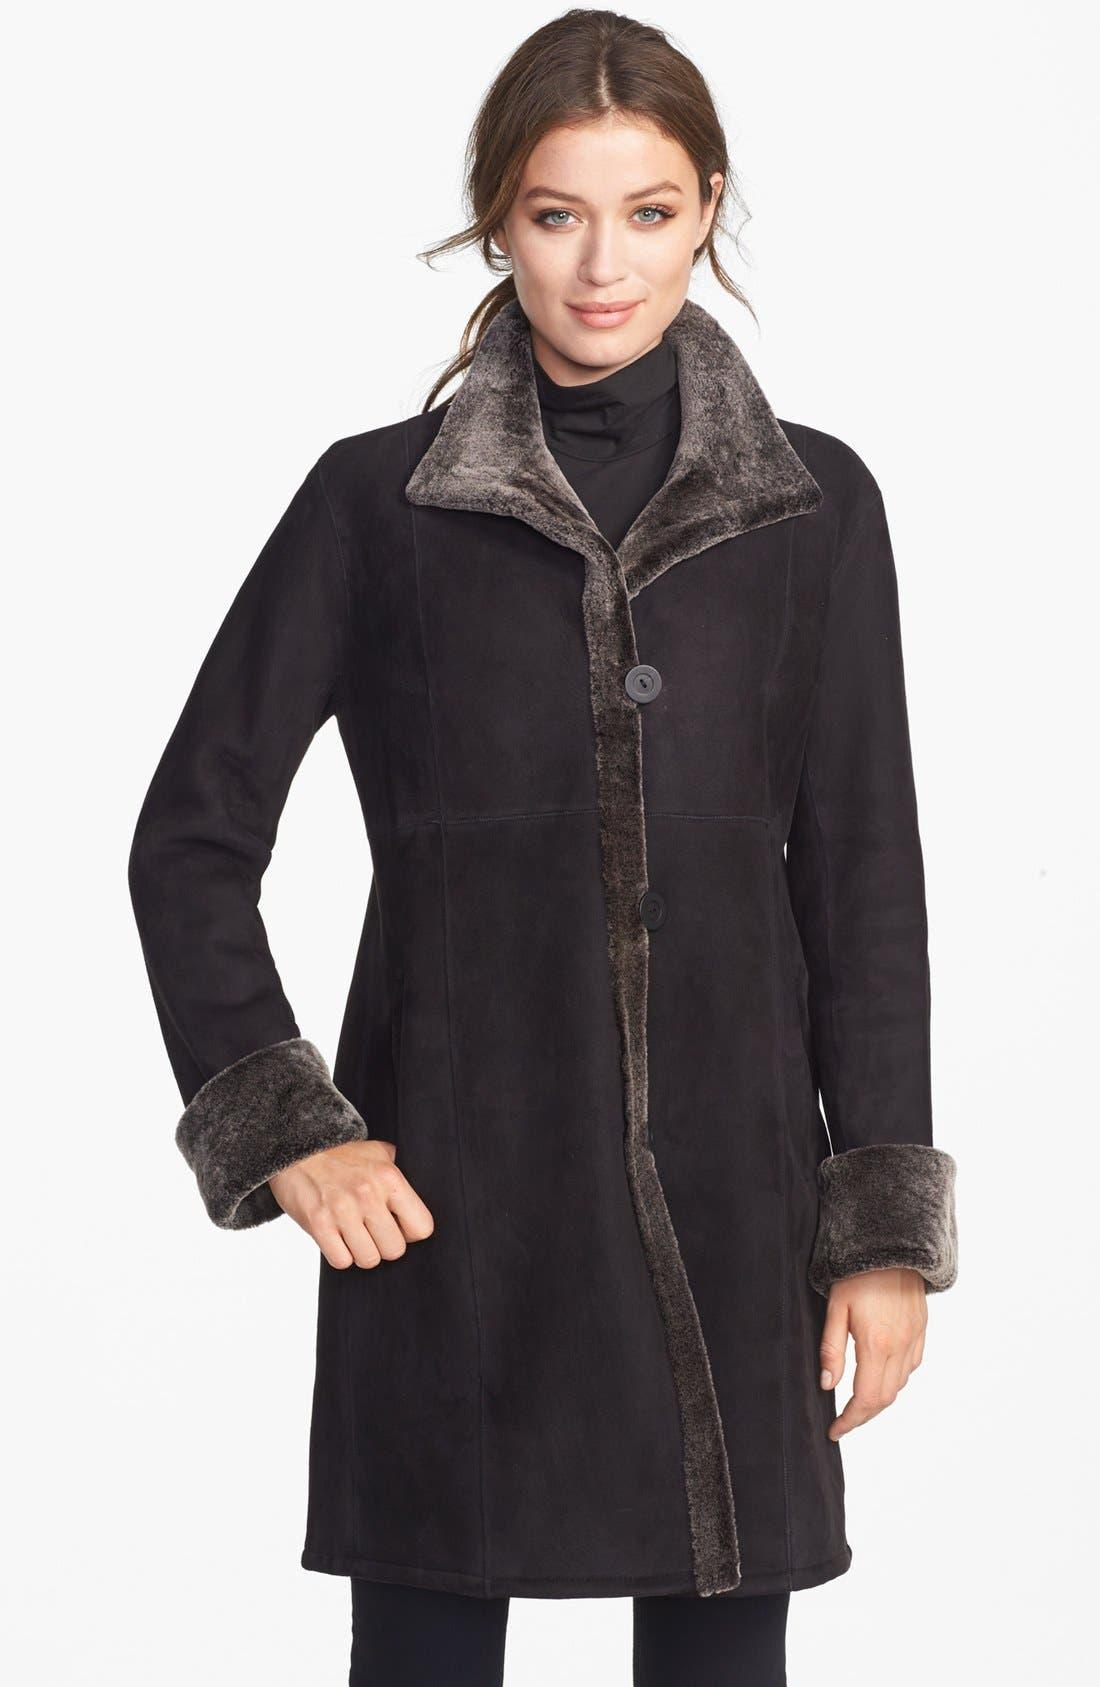 Alternate Image 1 Selected - Blue Duck Stand Collar Genuine Merino Shearling Coat